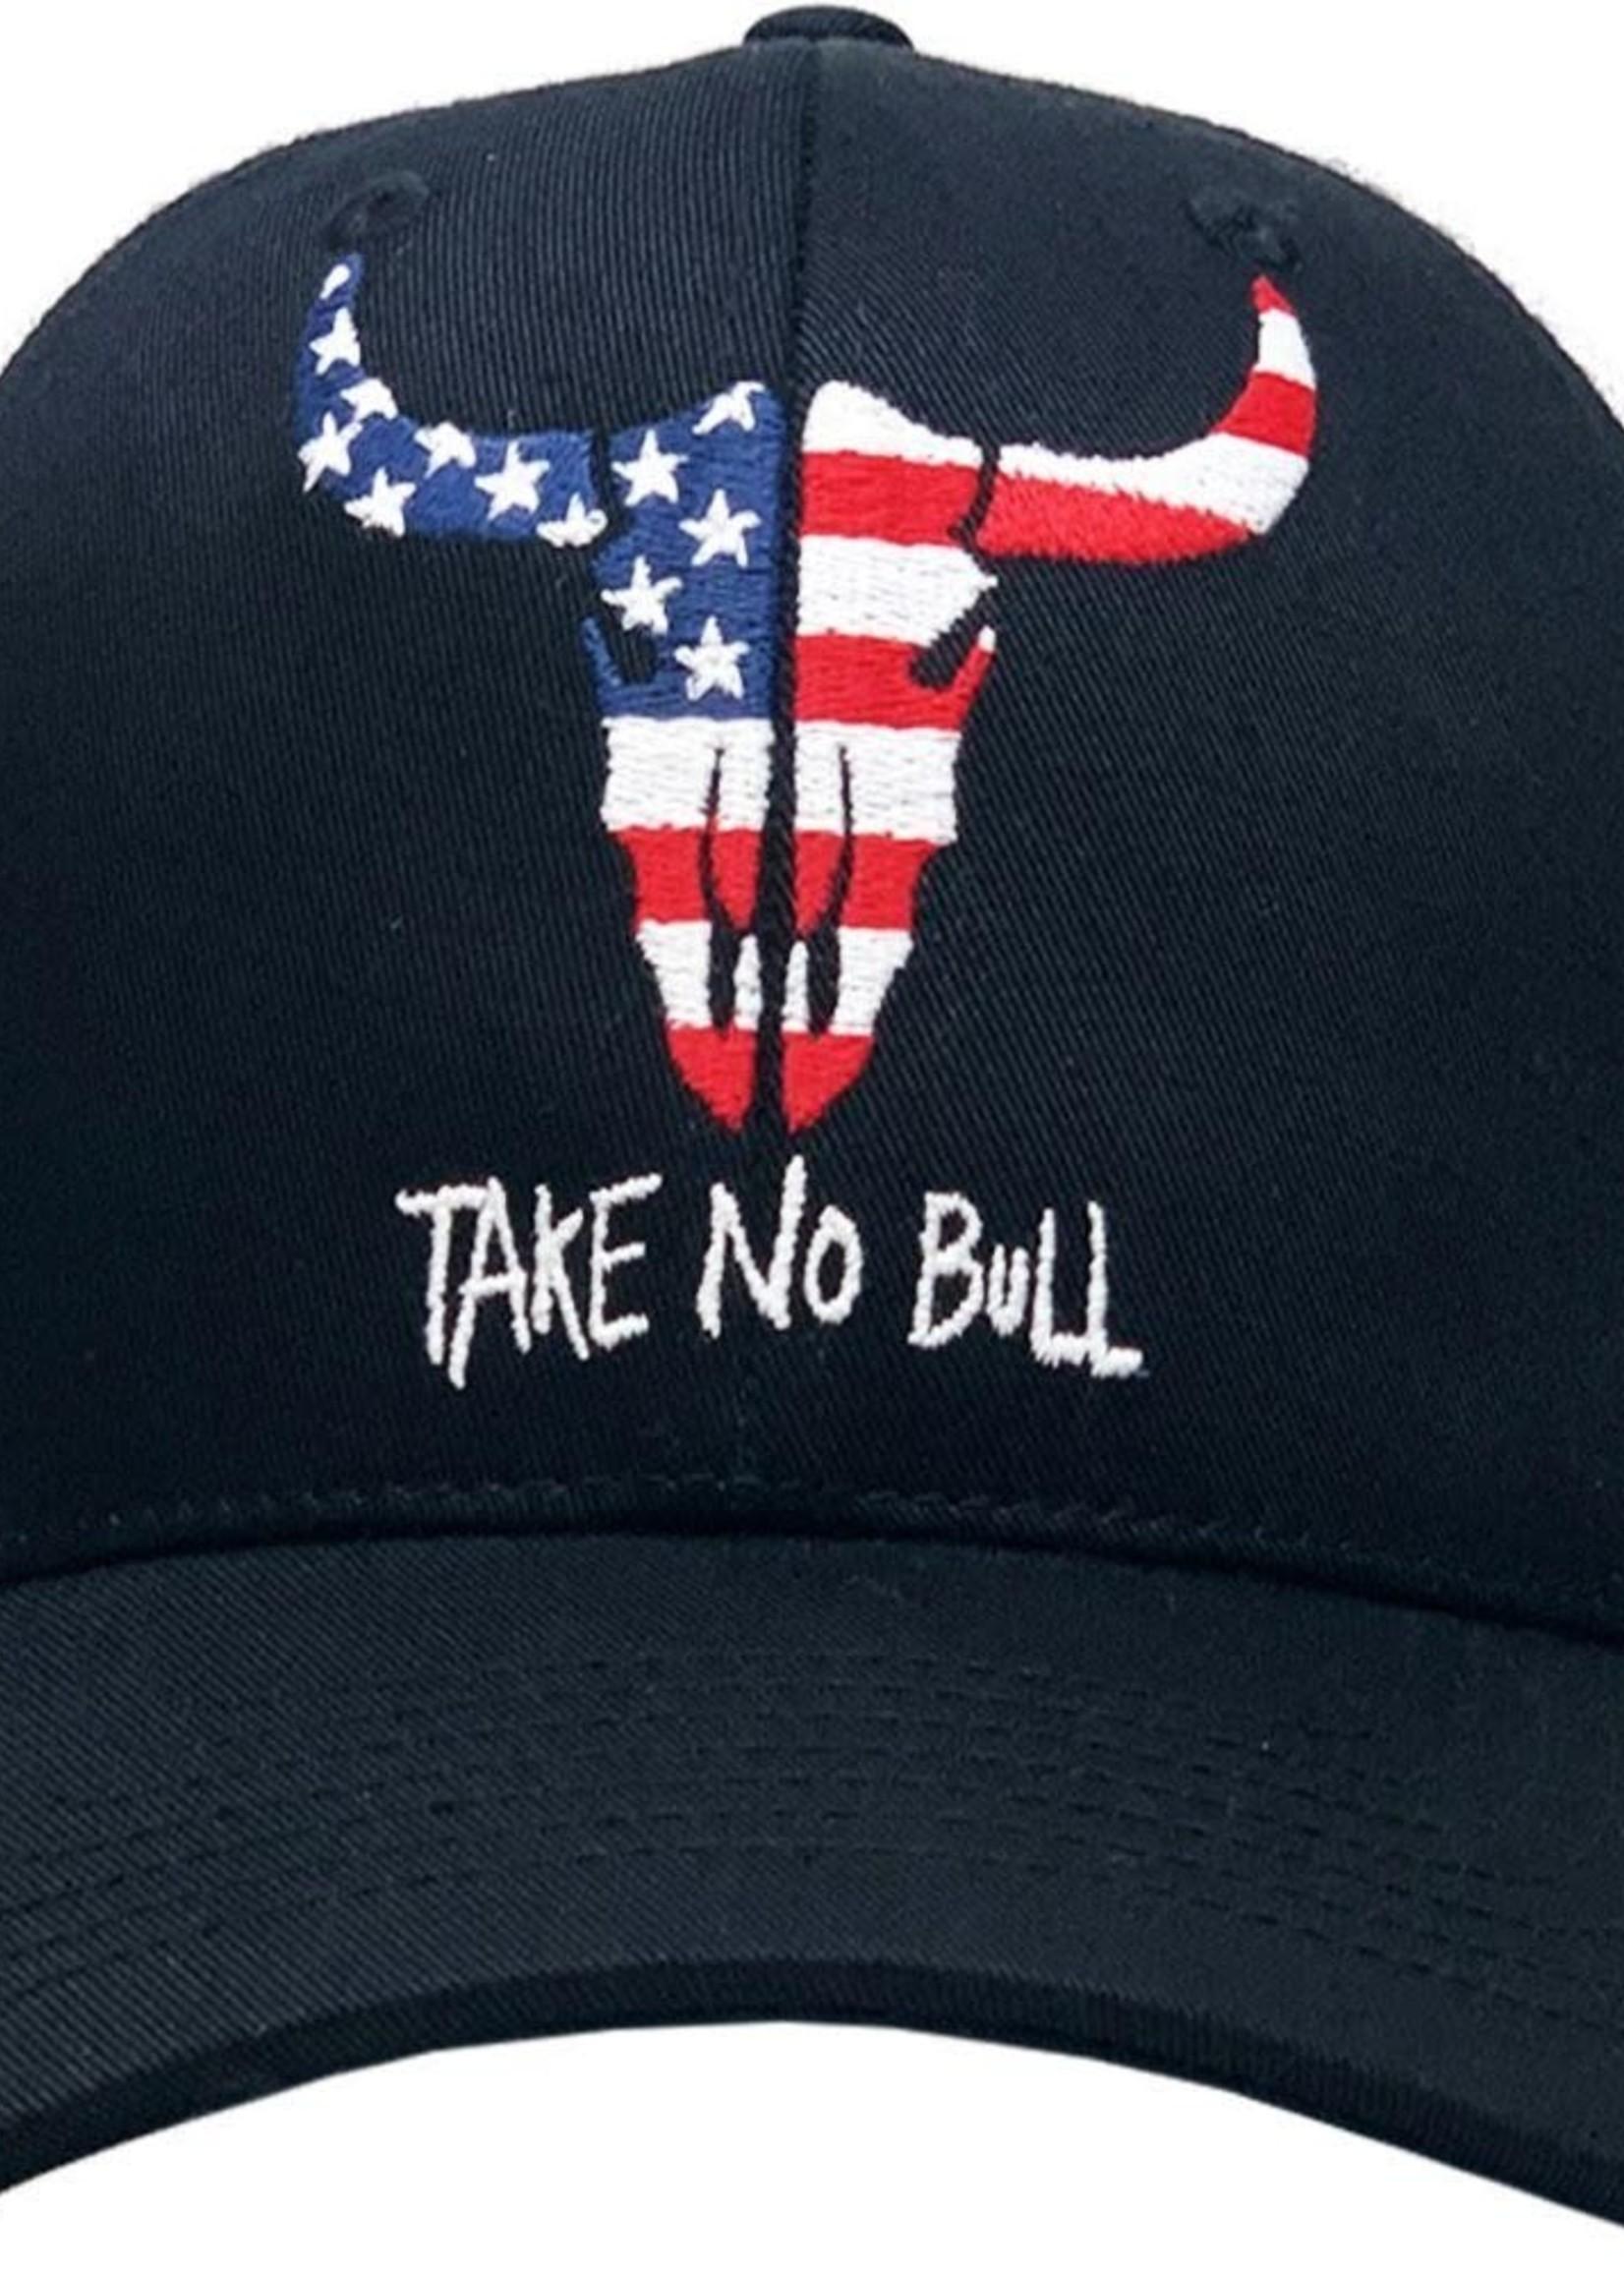 USA Take No Bull Vintage Mesh Baseball Cap